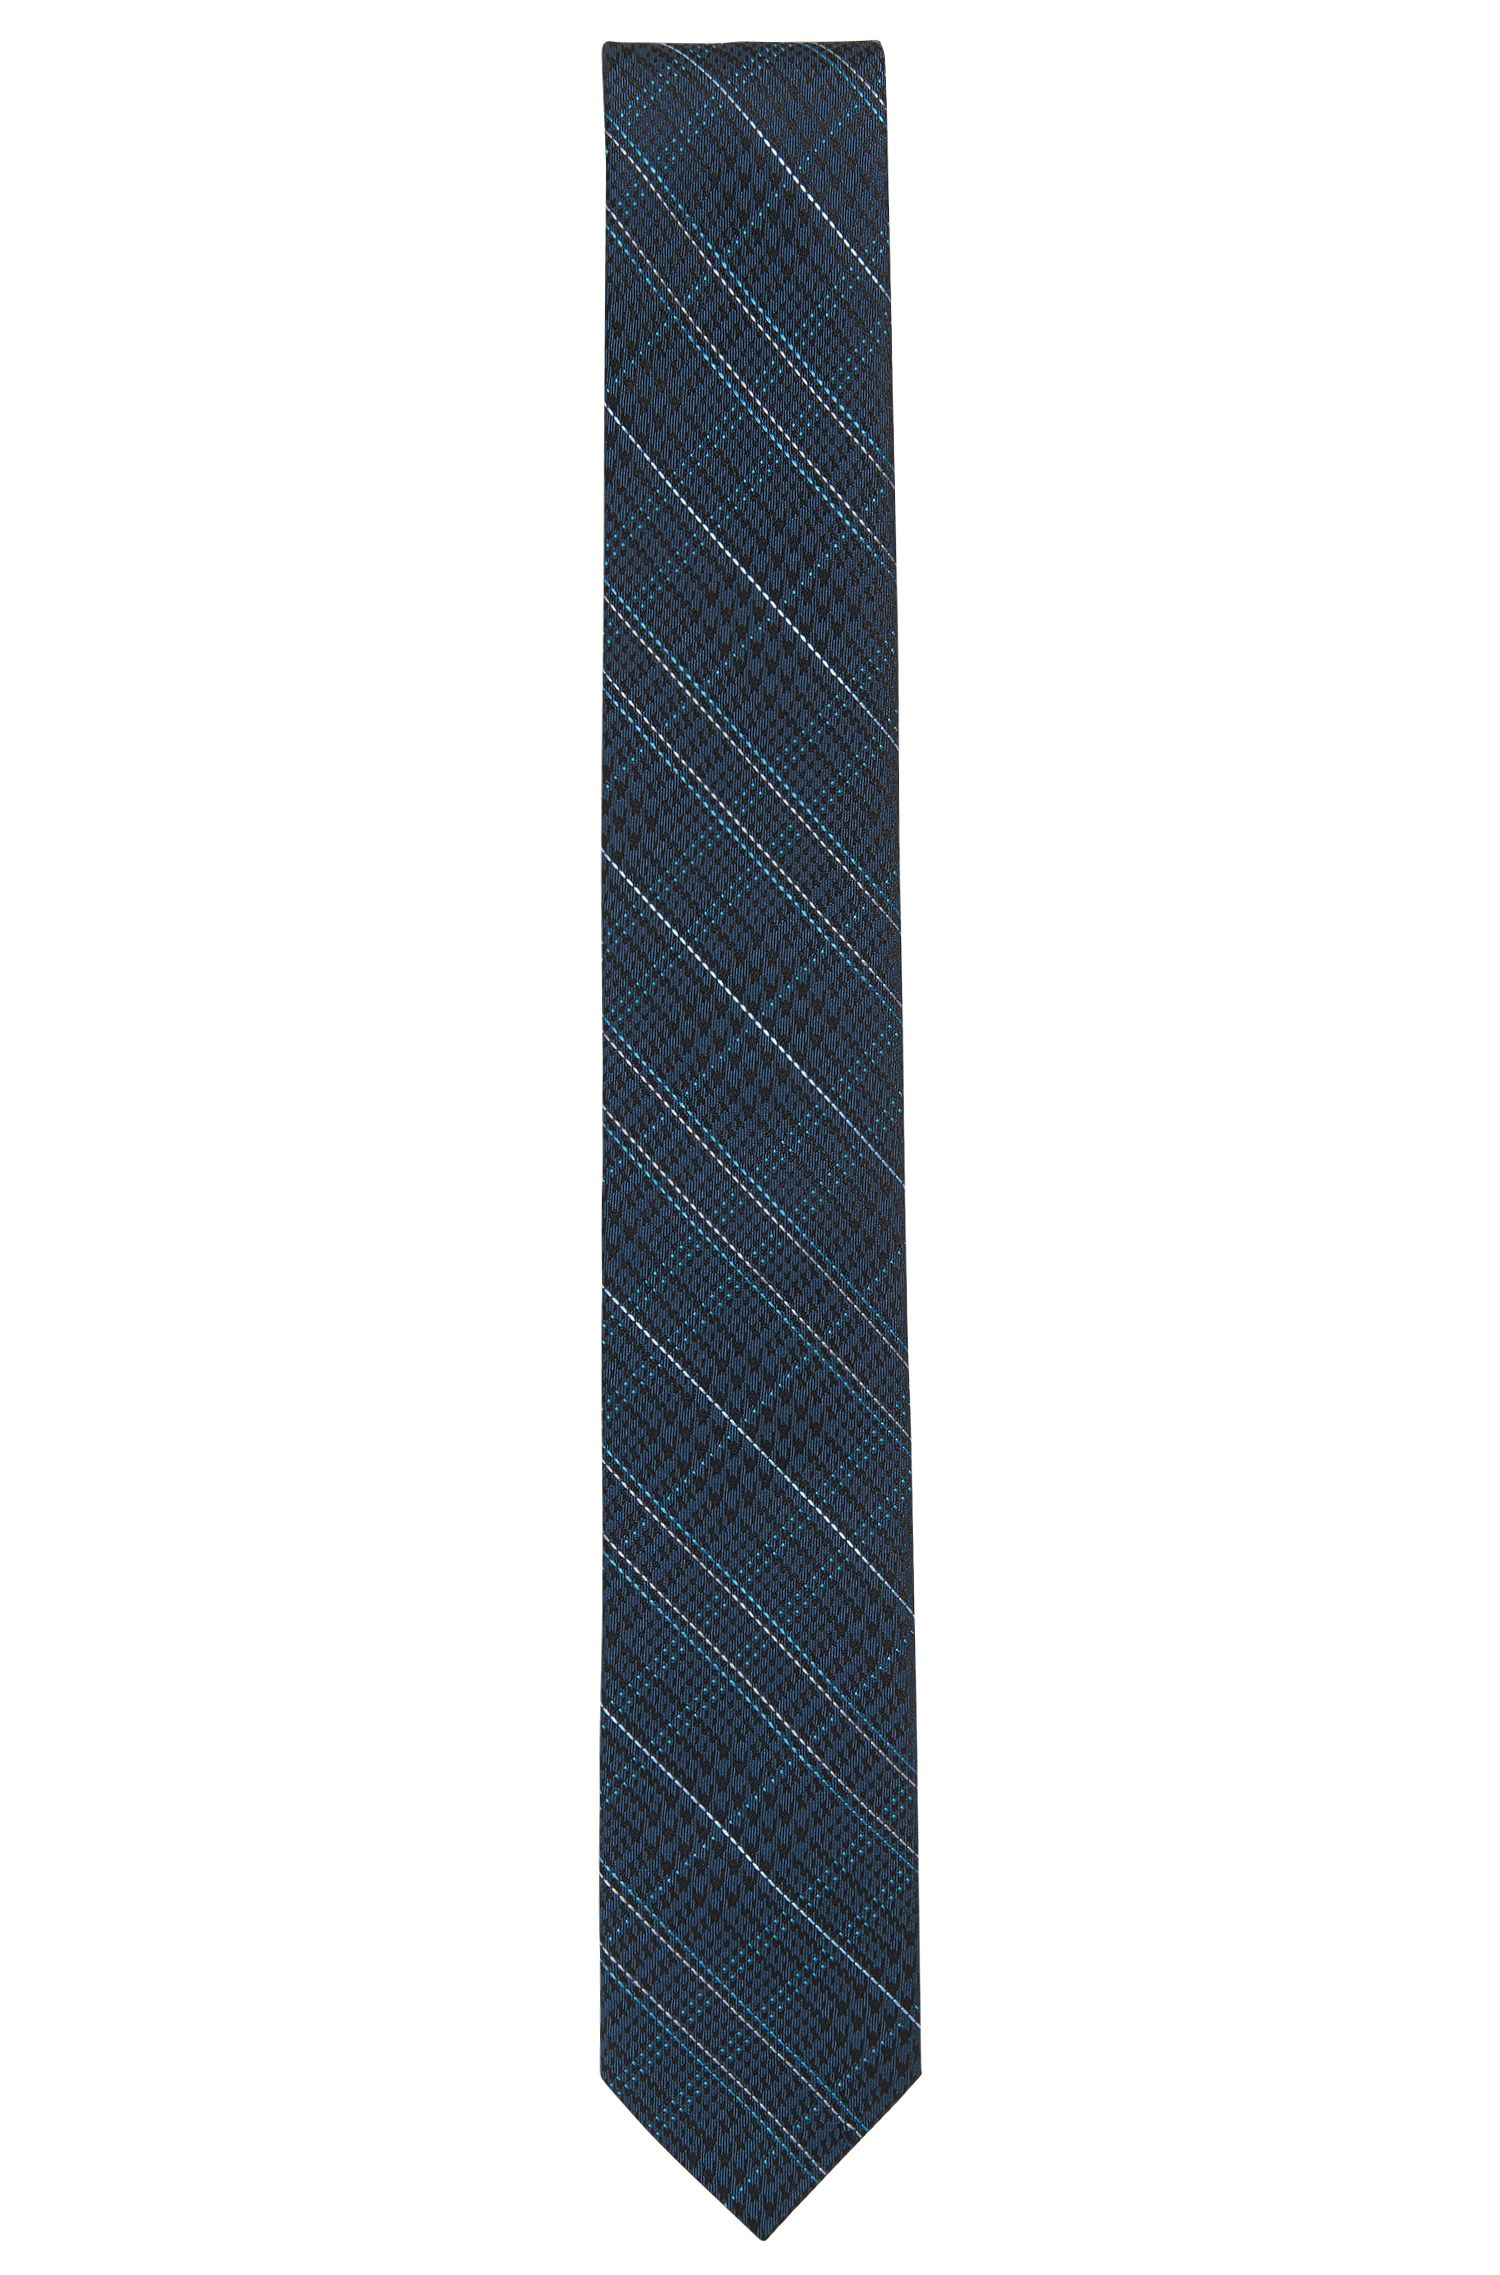 Krawatte aus Seiden-Jacquard mit Glencheck-Karo